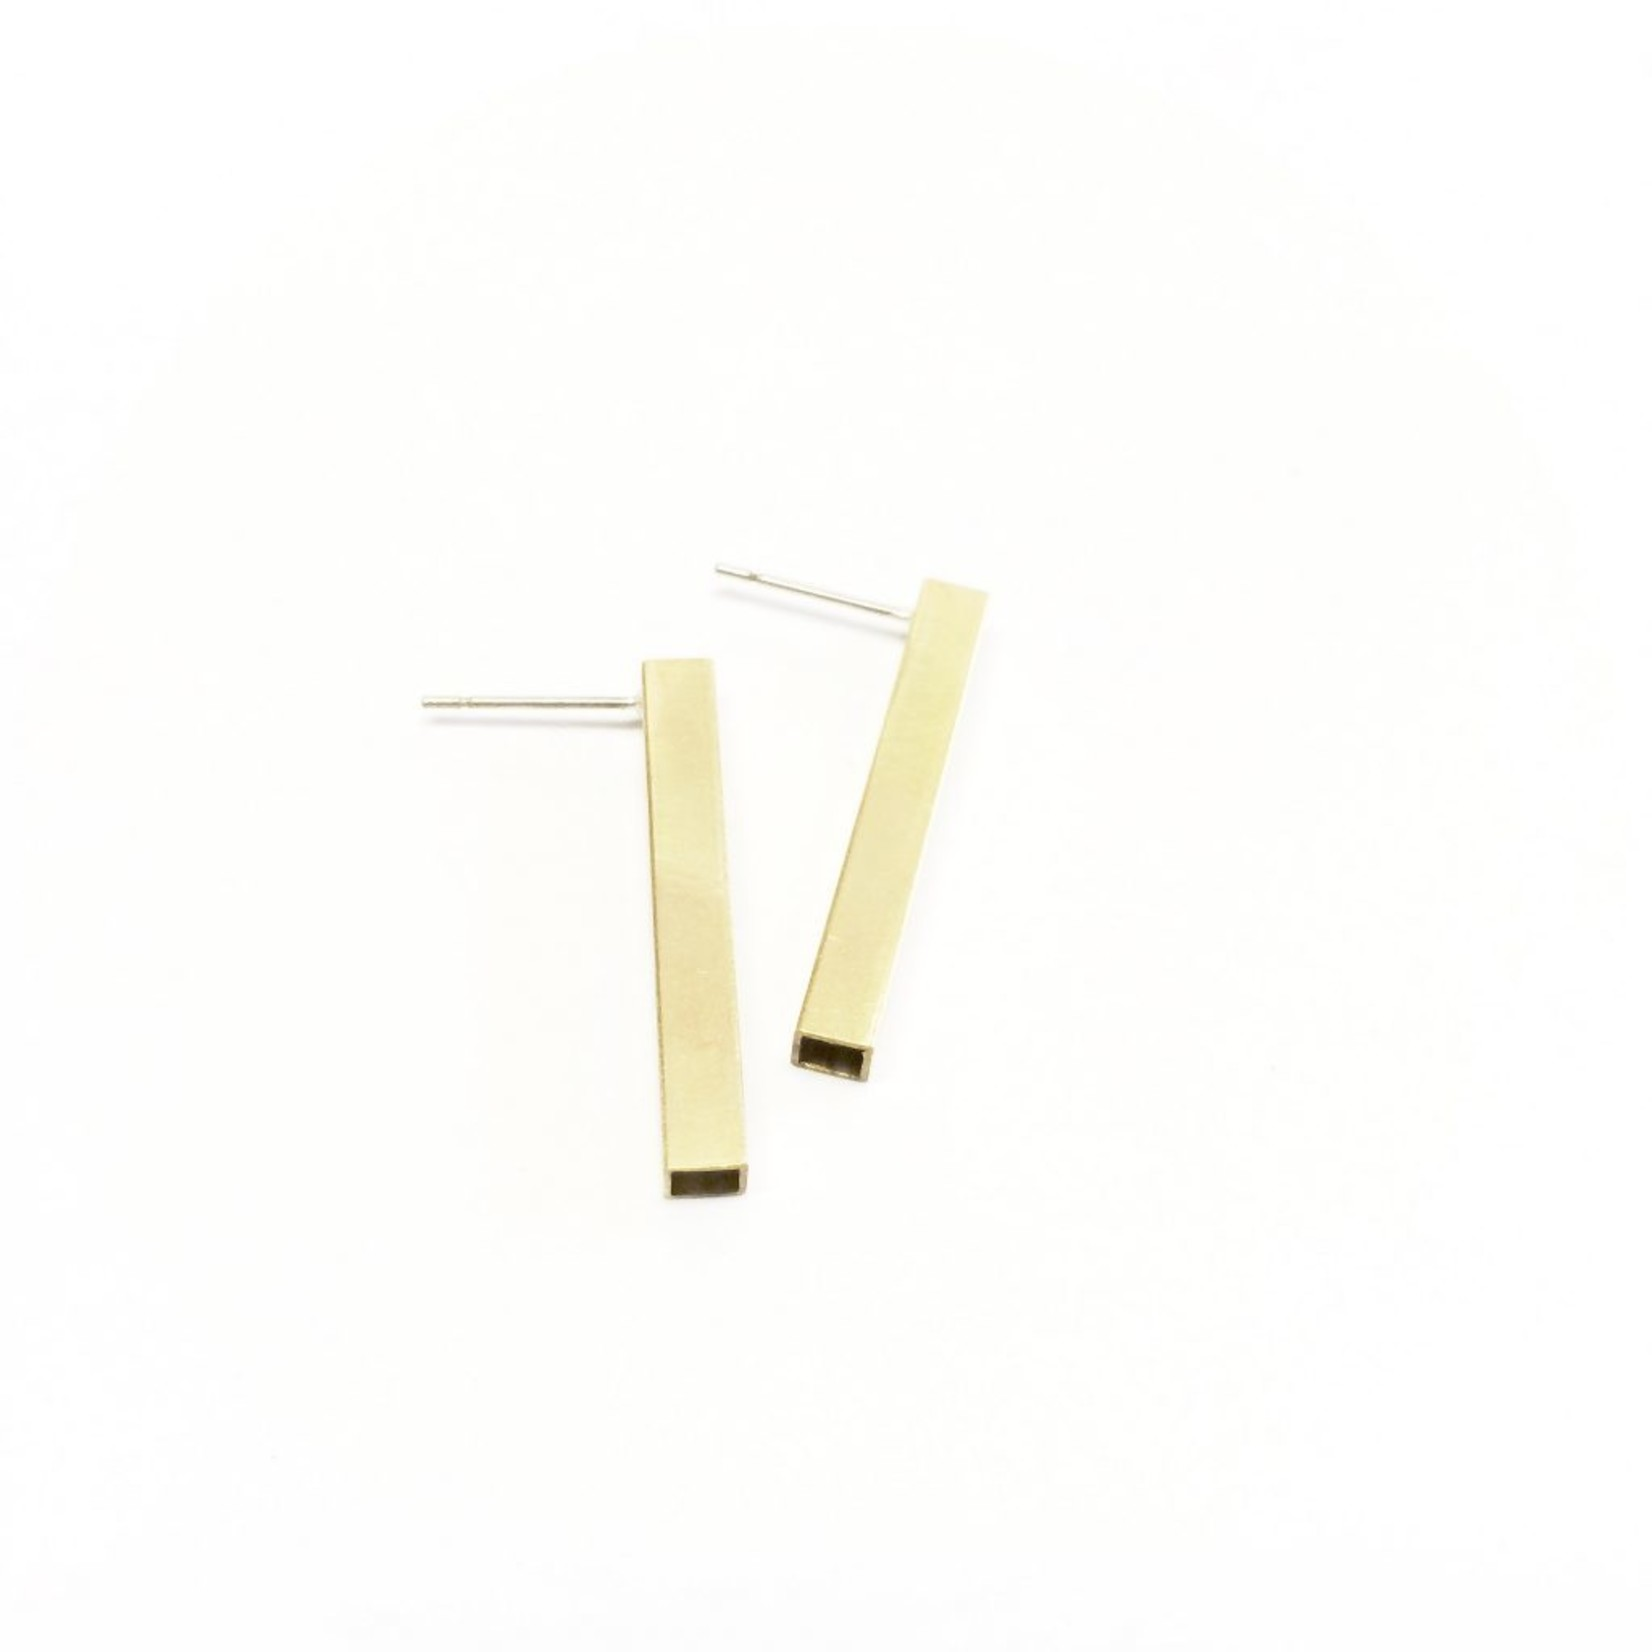 Inimini Homemade Brass square bar studs M